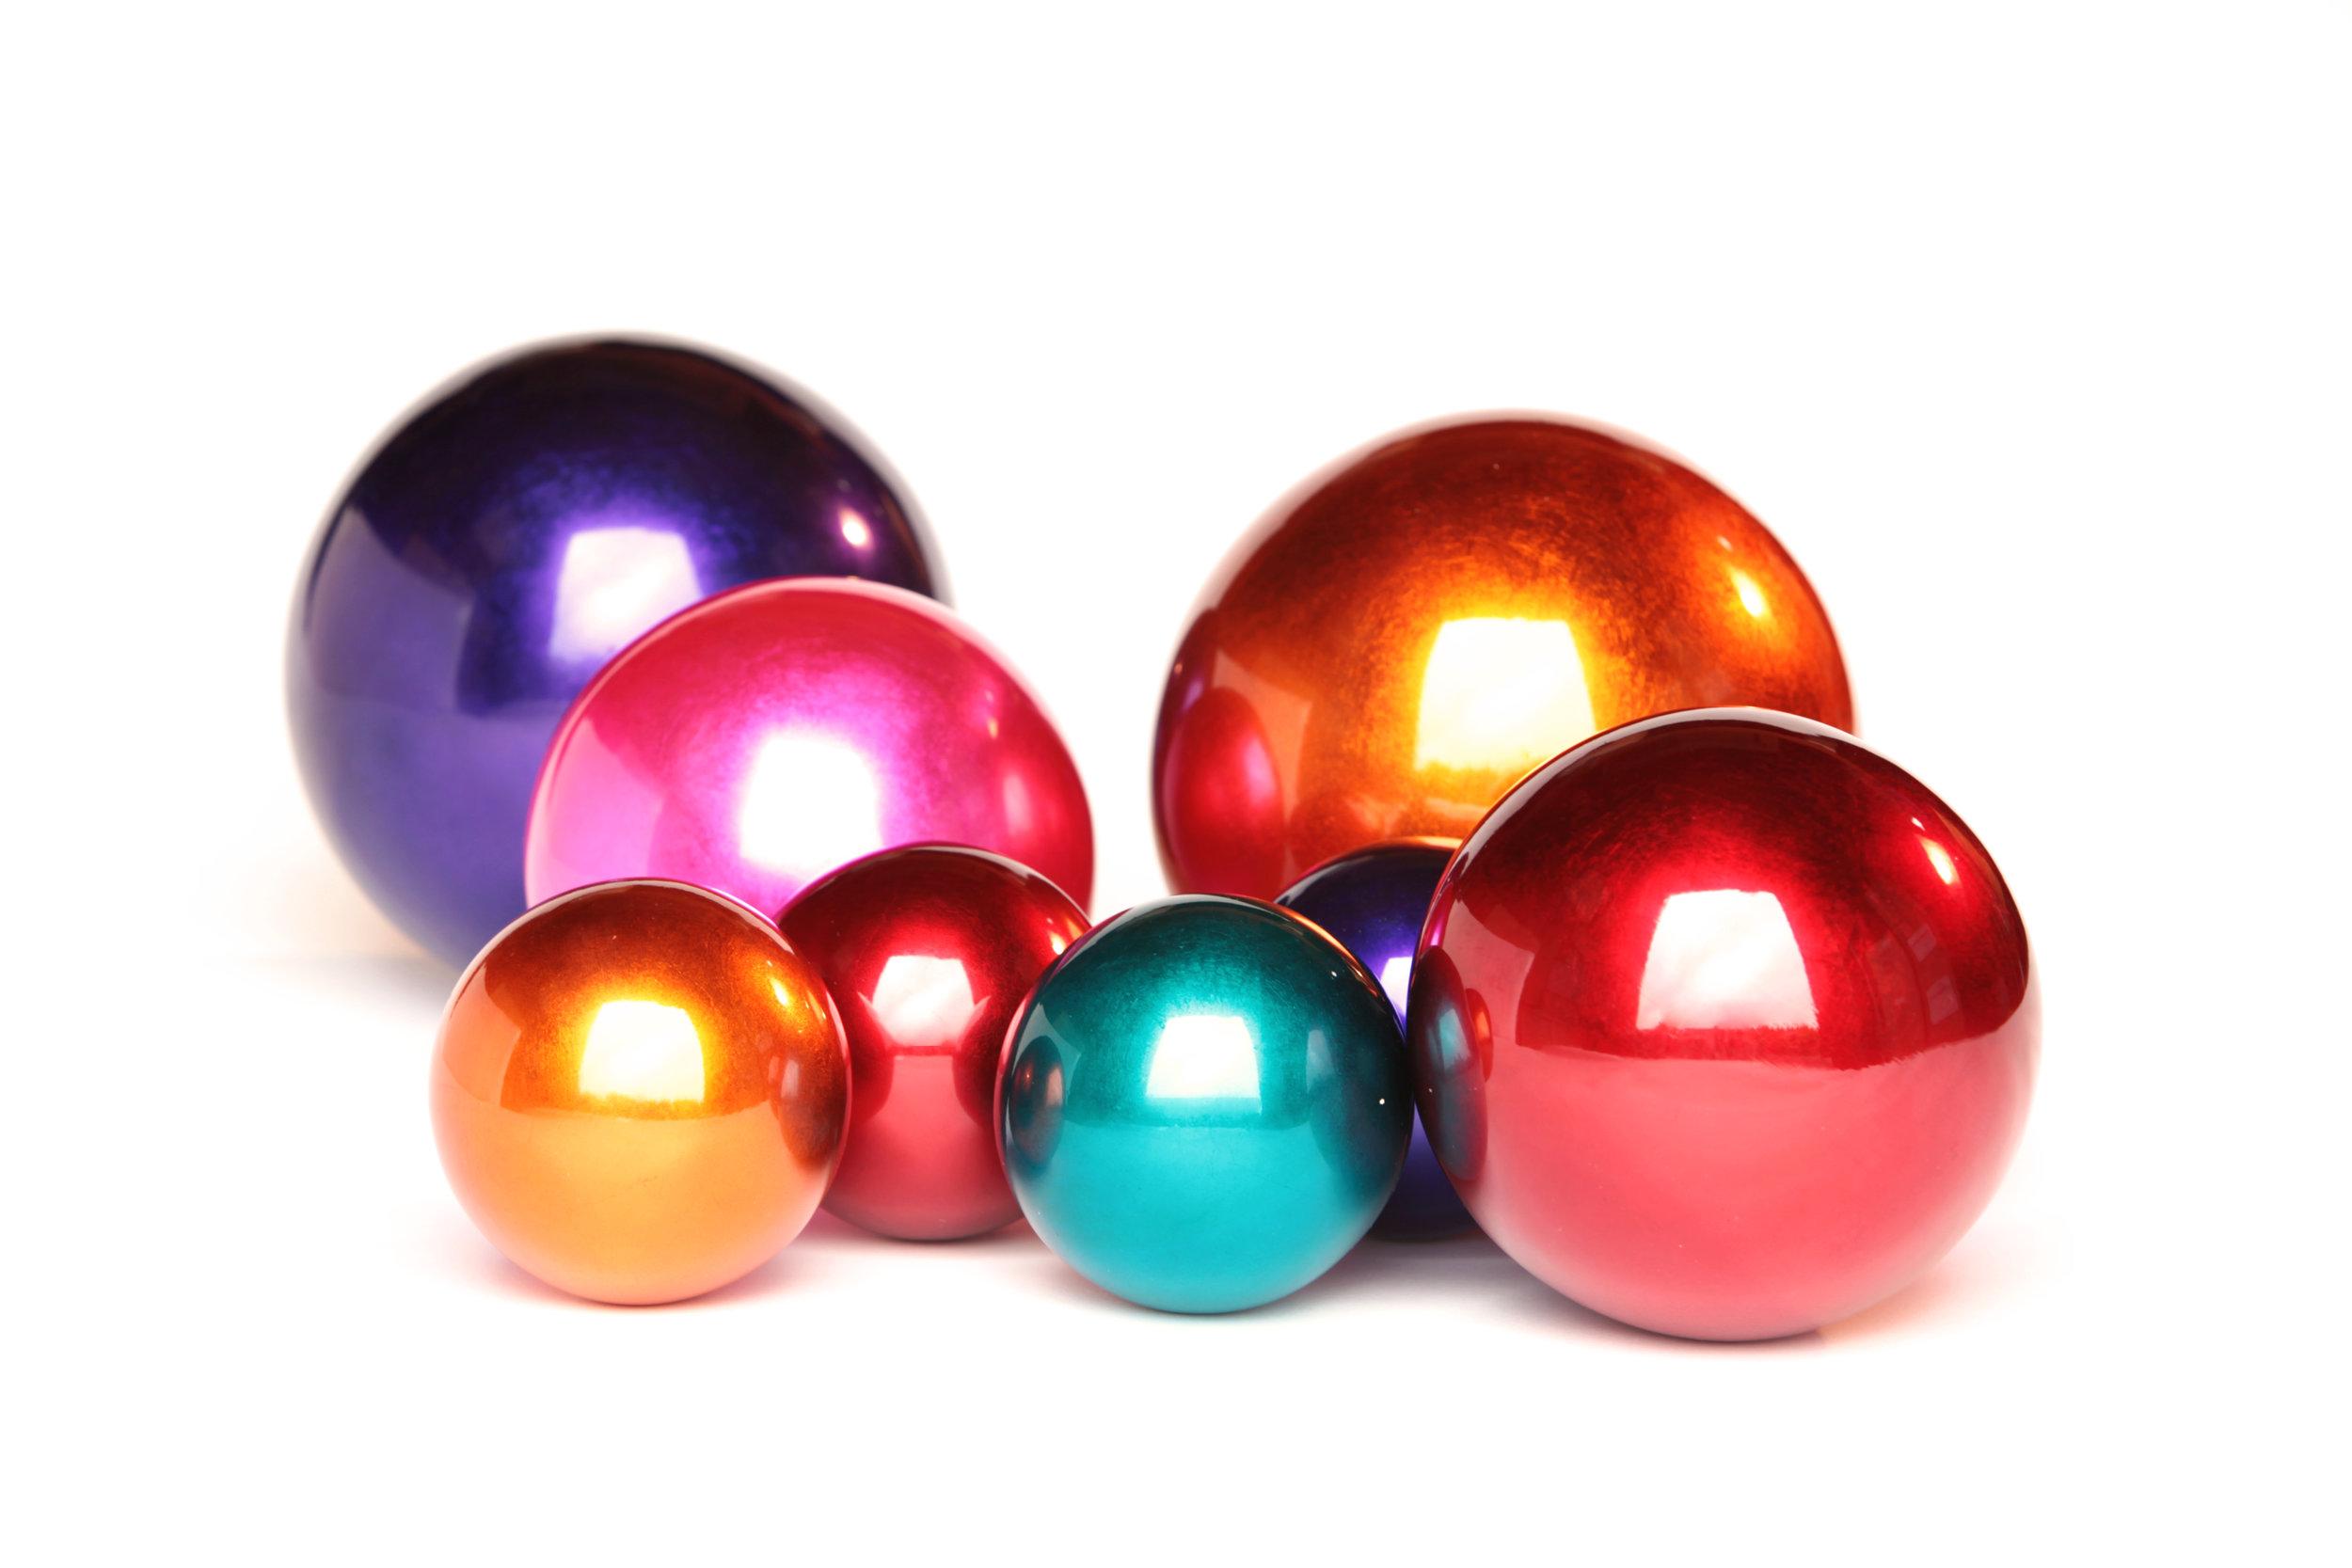 deco balls L,M,S.jpg